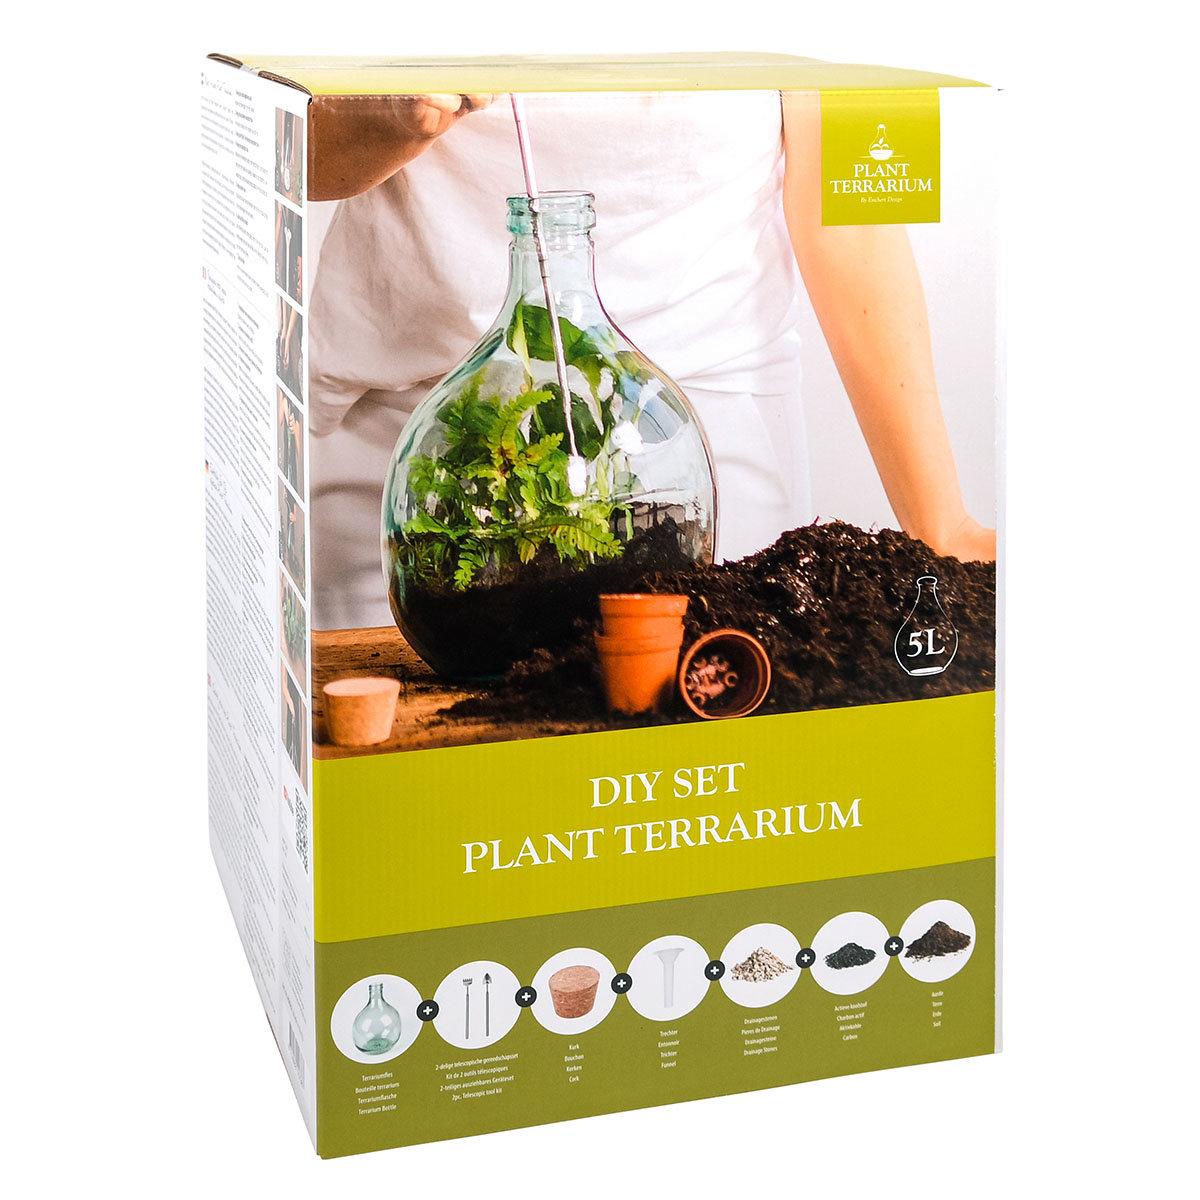 DIY Terrariumflasche Komplettset, 5 Liter | #5